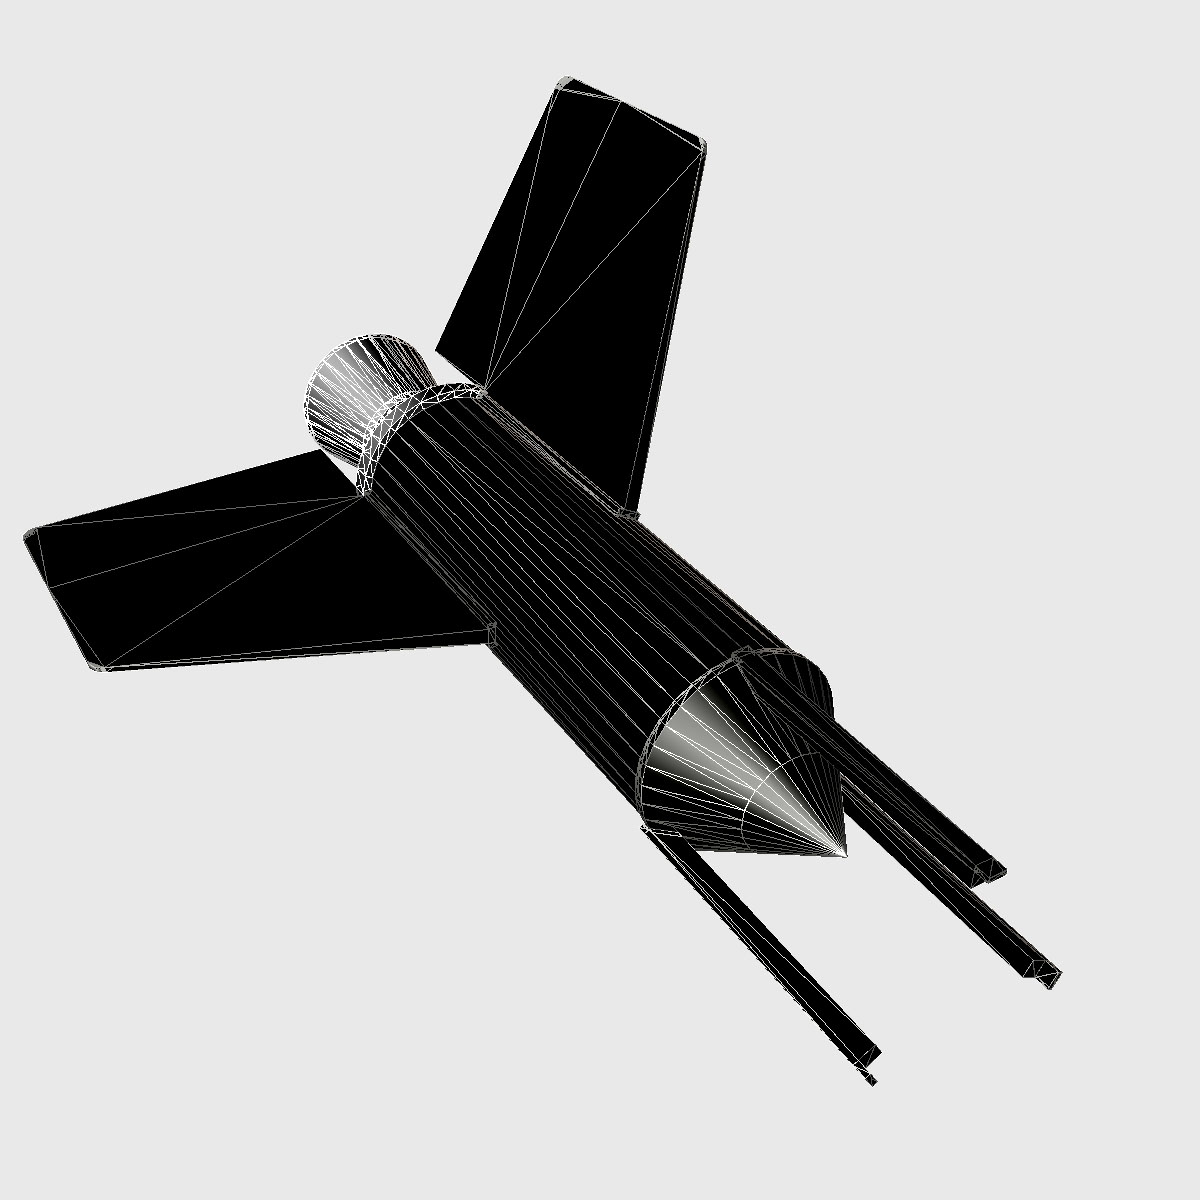 nasa aerobee 100 rocket 3d model 3ds dxf fbx blend cob dae x  obj 158441